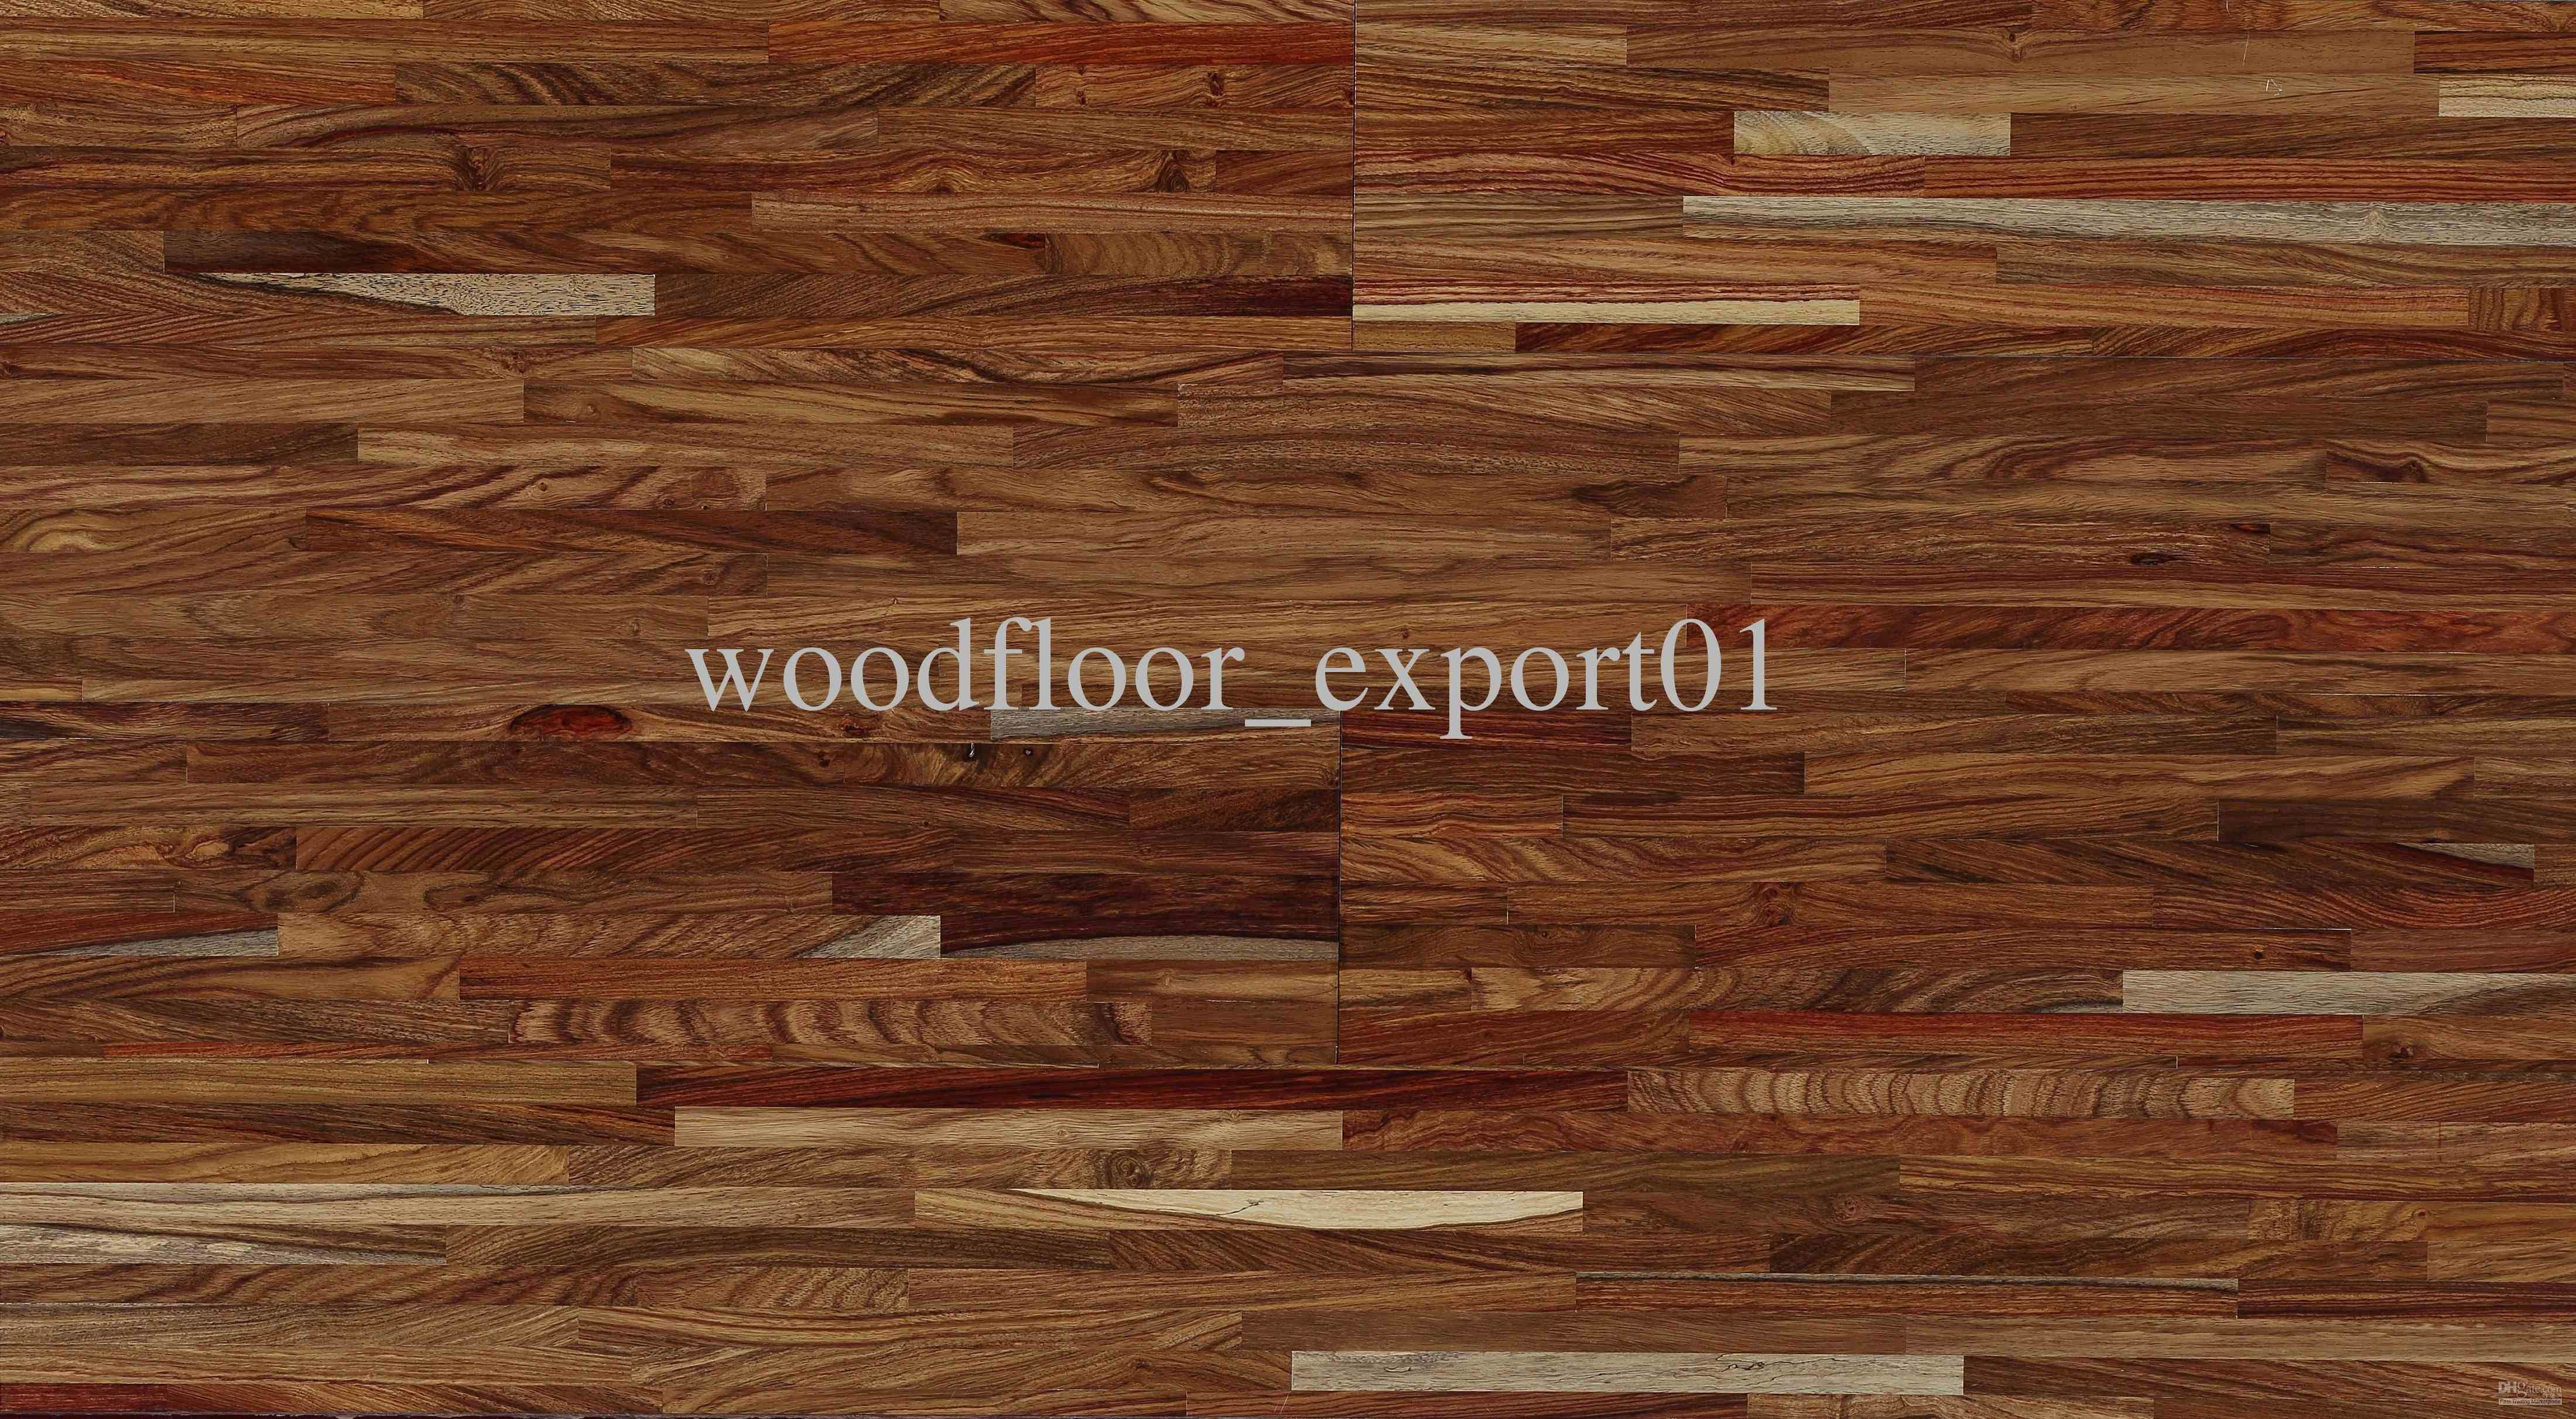 bona hardwood floor cleaner of 19 awesome pergo vs hardwood pics dizpos com regarding 50 lovely hardwood floor options 50 s